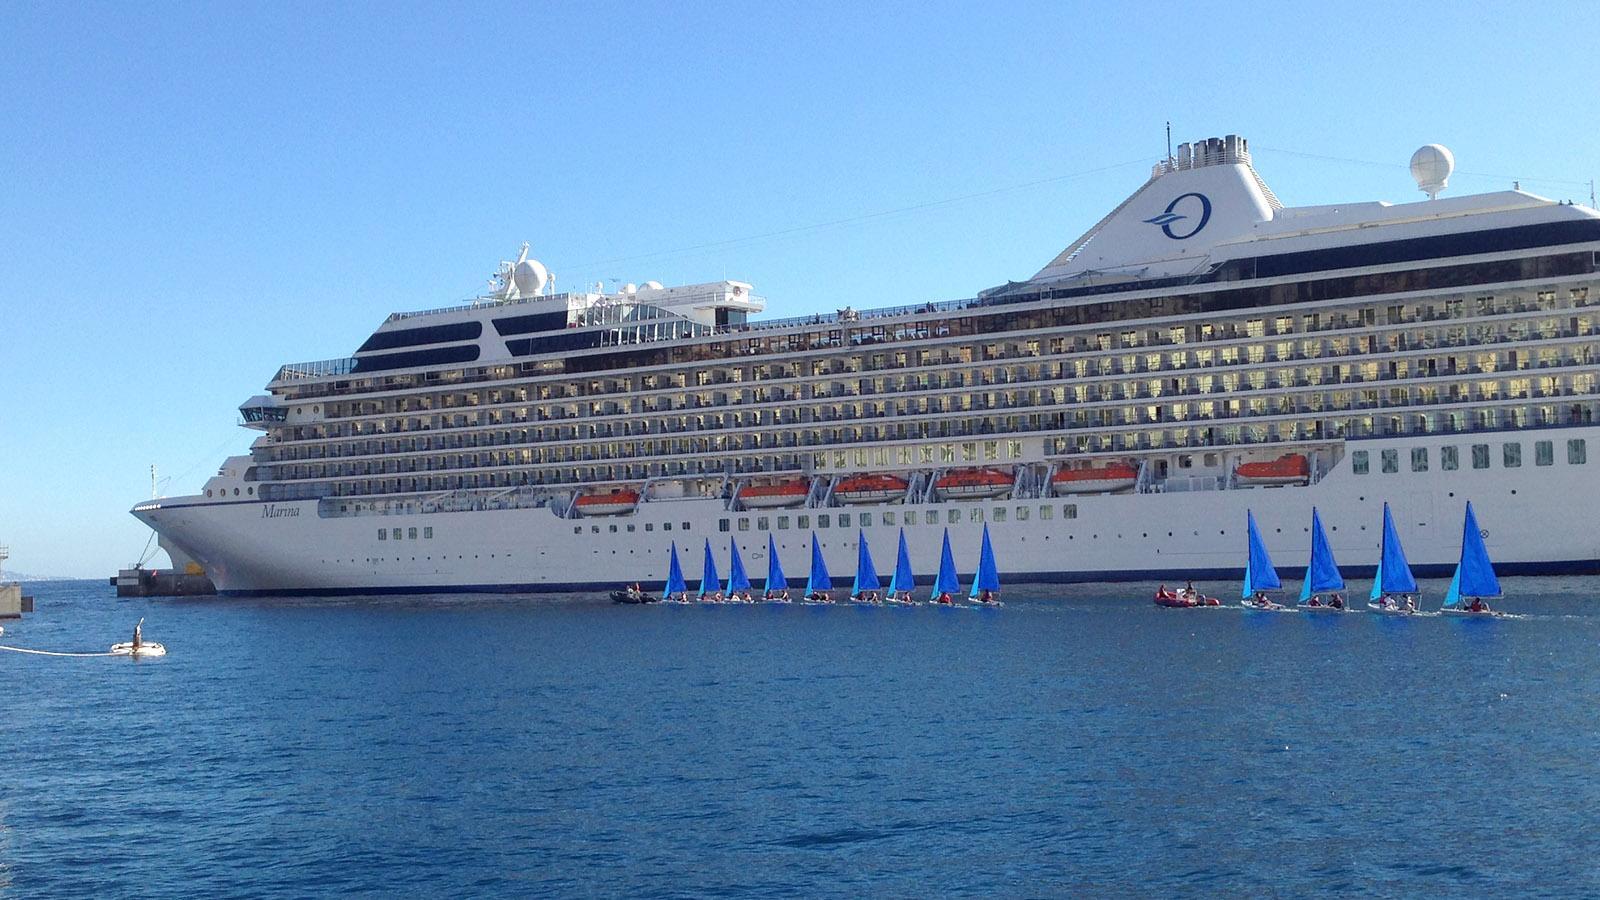 Kontraste à la Monaco: Segelschüler vor einem Kreuzfahrtschiff. Foto: Hilke Maunder